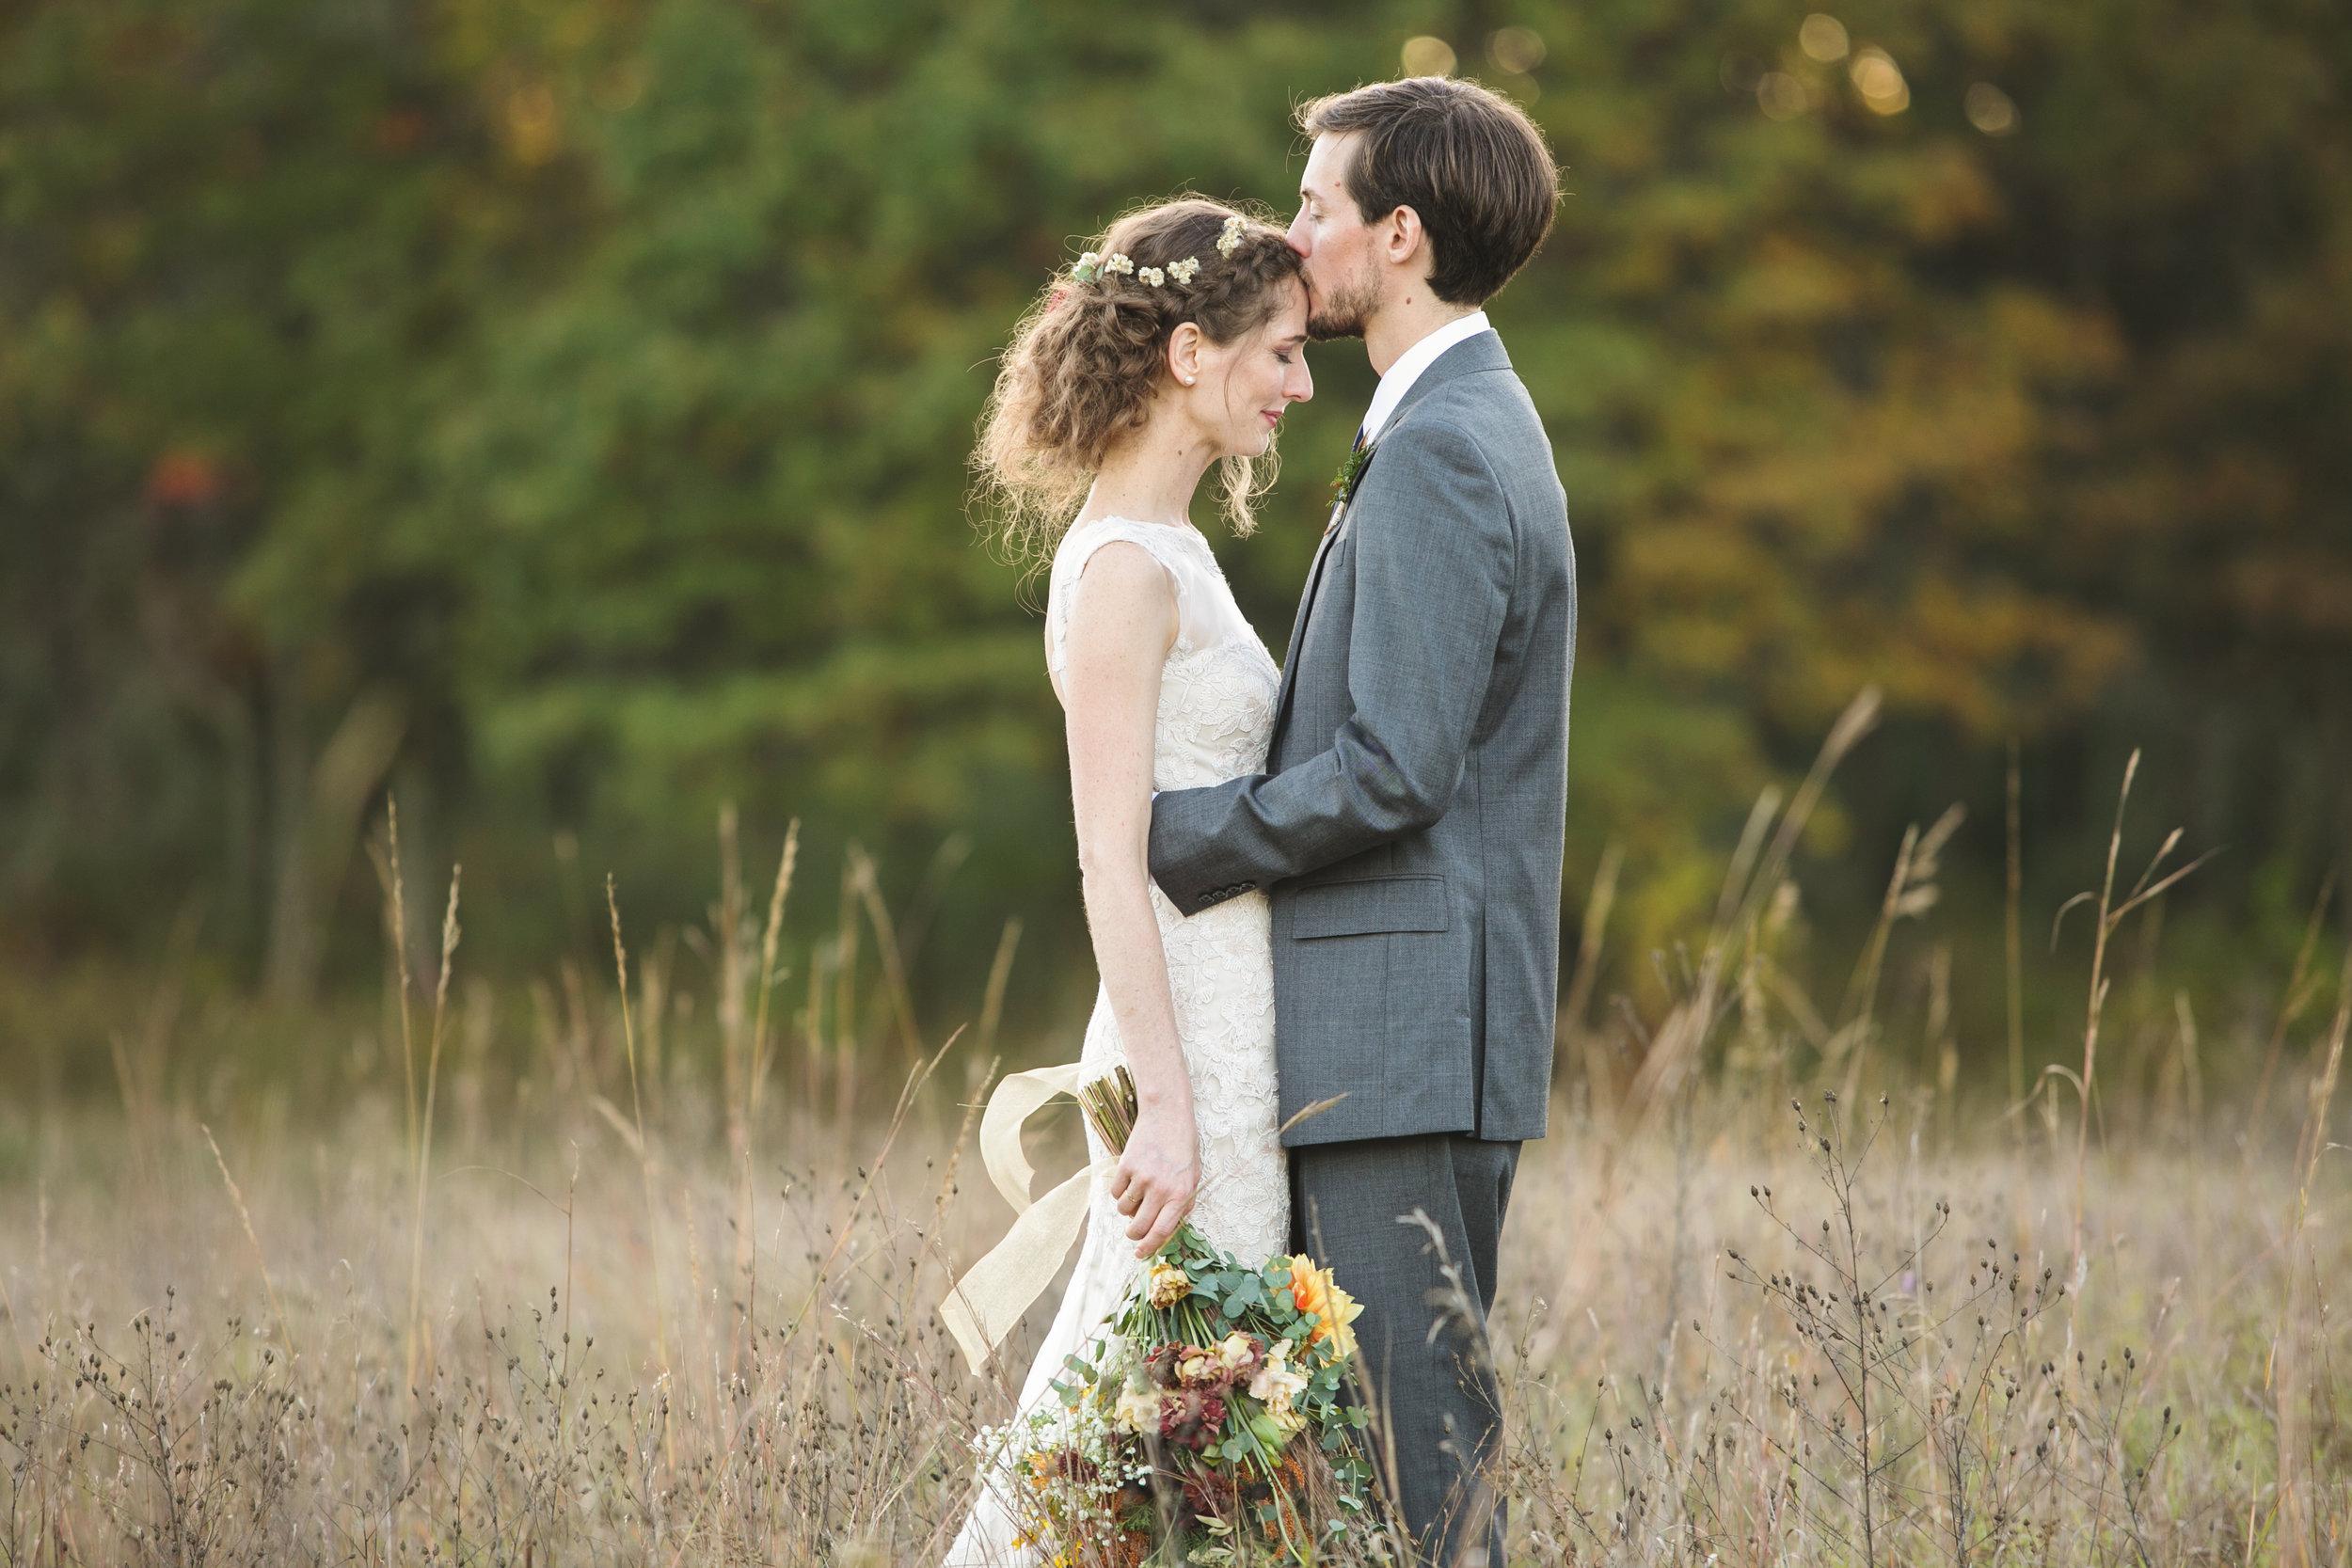 Stillwater_MN_Wedding_Photographer_46.jpg